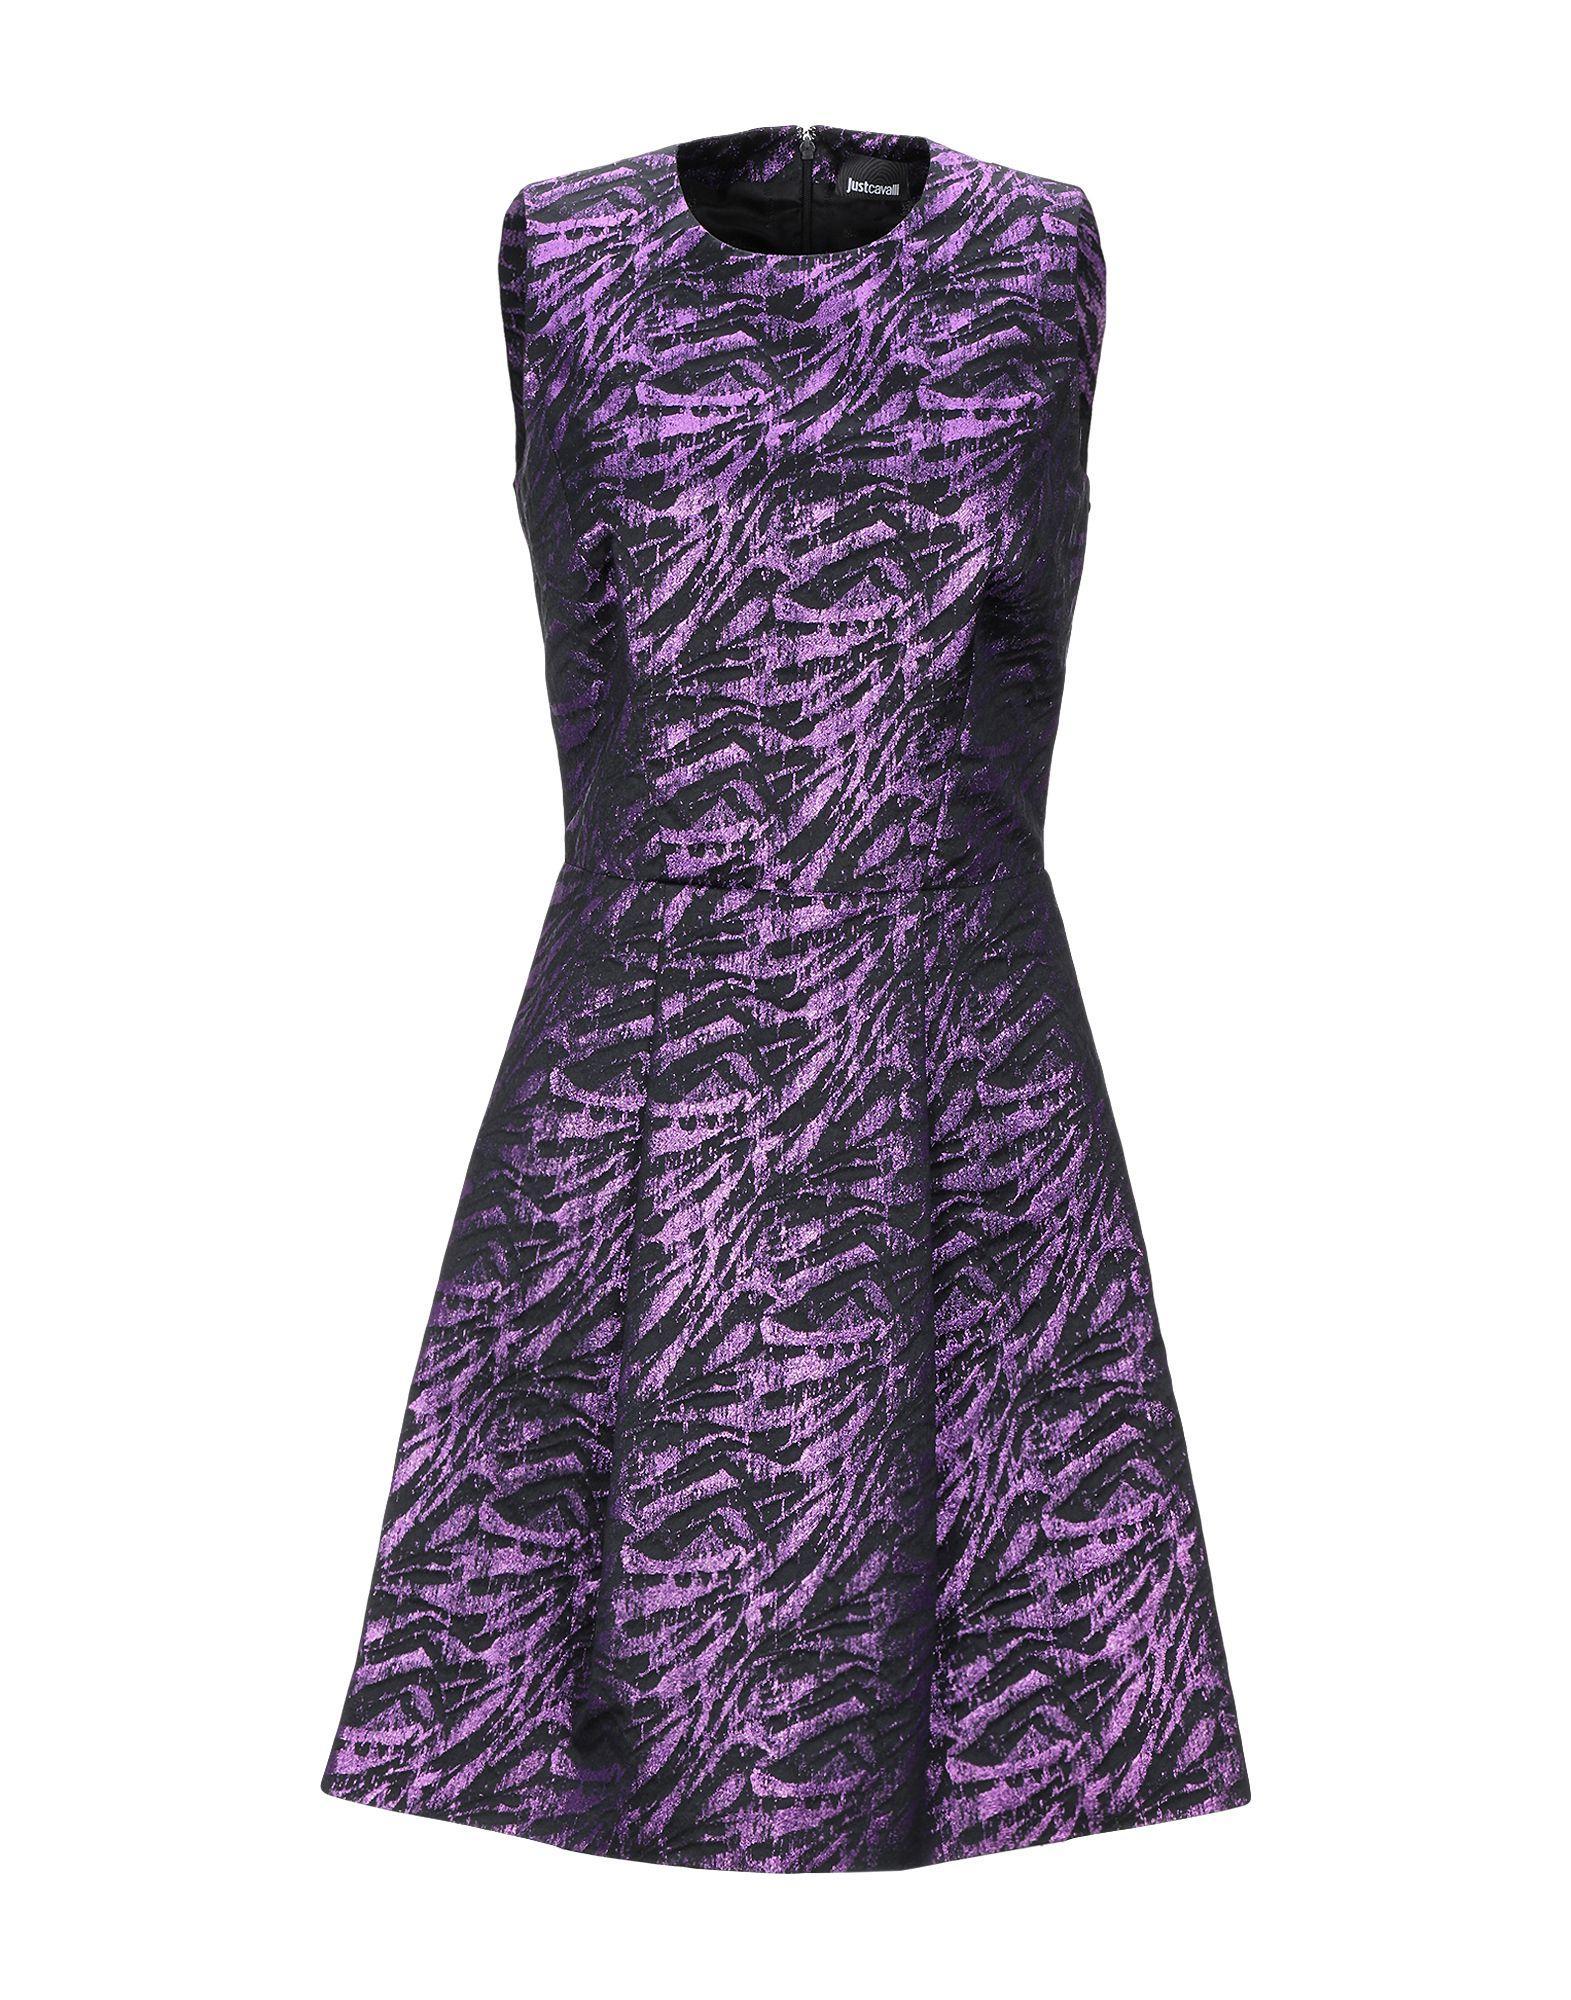 wholesale dealer b6540 c7fe9 Just Cavalli Short Dress in Purple - Lyst